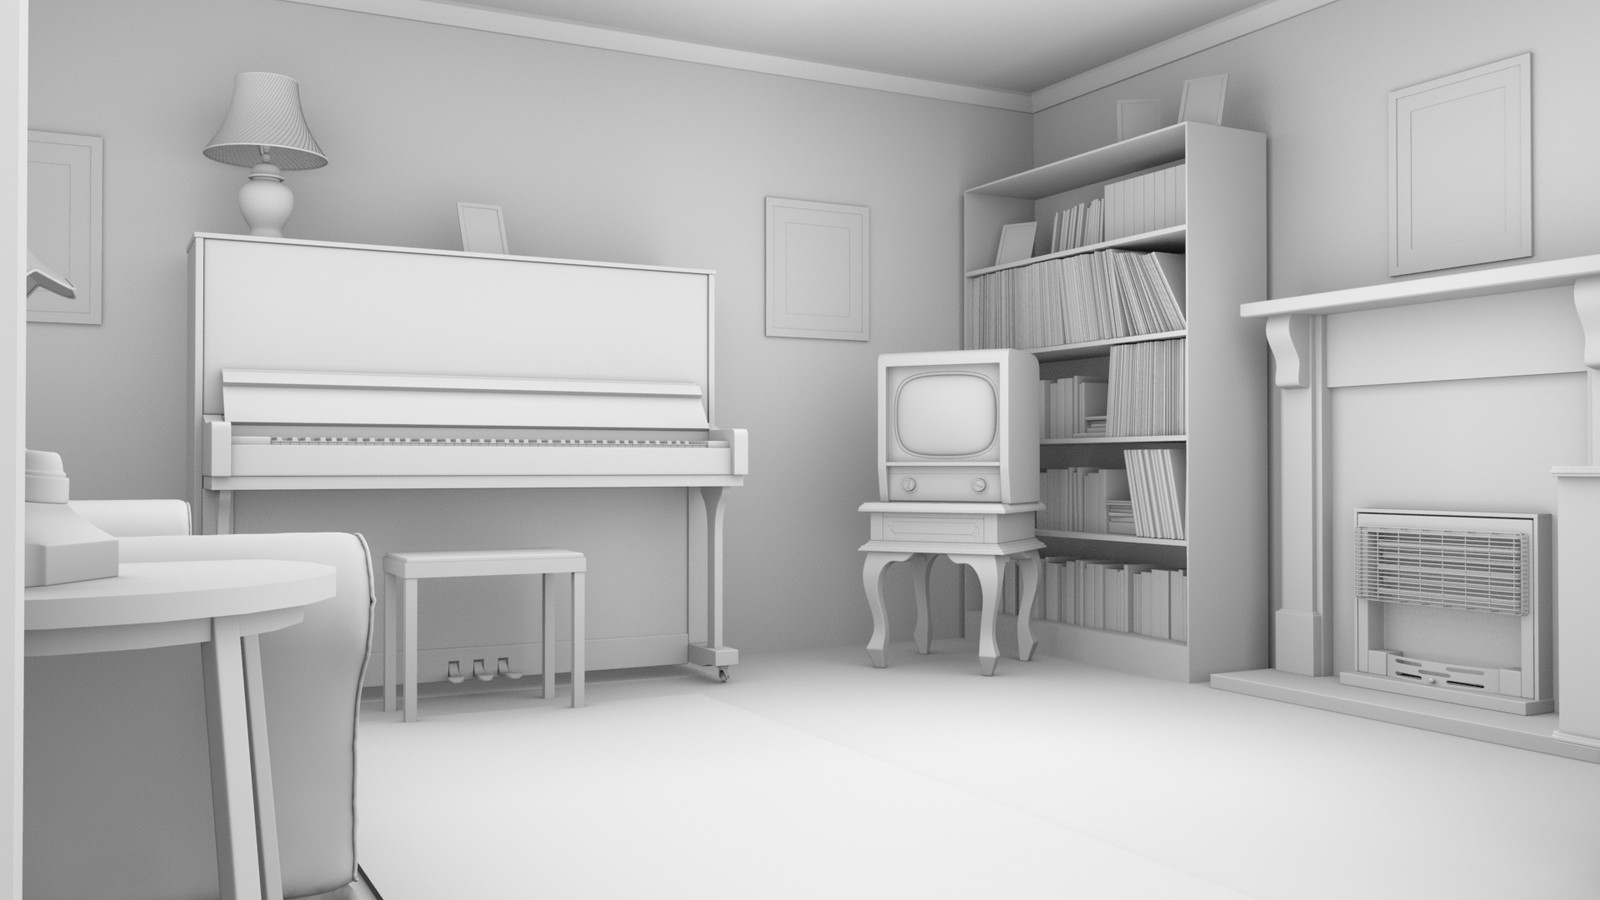 WIP - 'Birthday' film: 1960's Living Room Environment